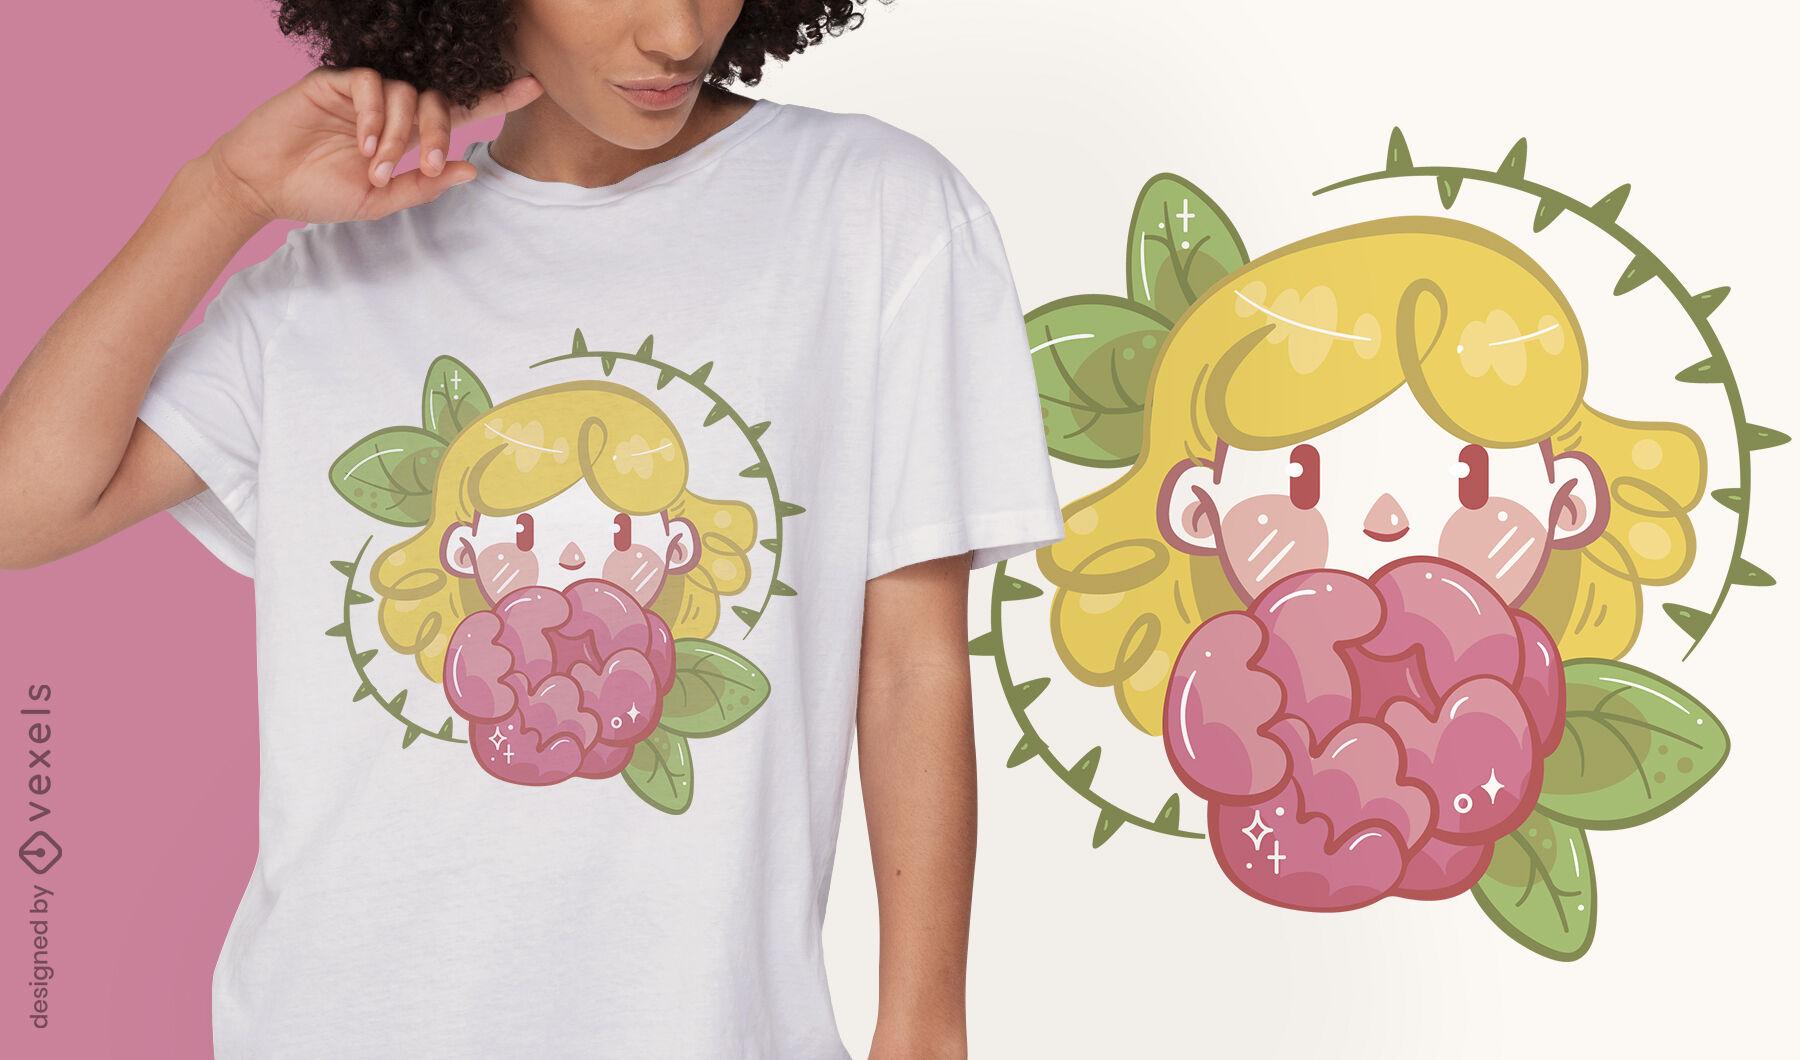 Menina com design de t-shirt de flores